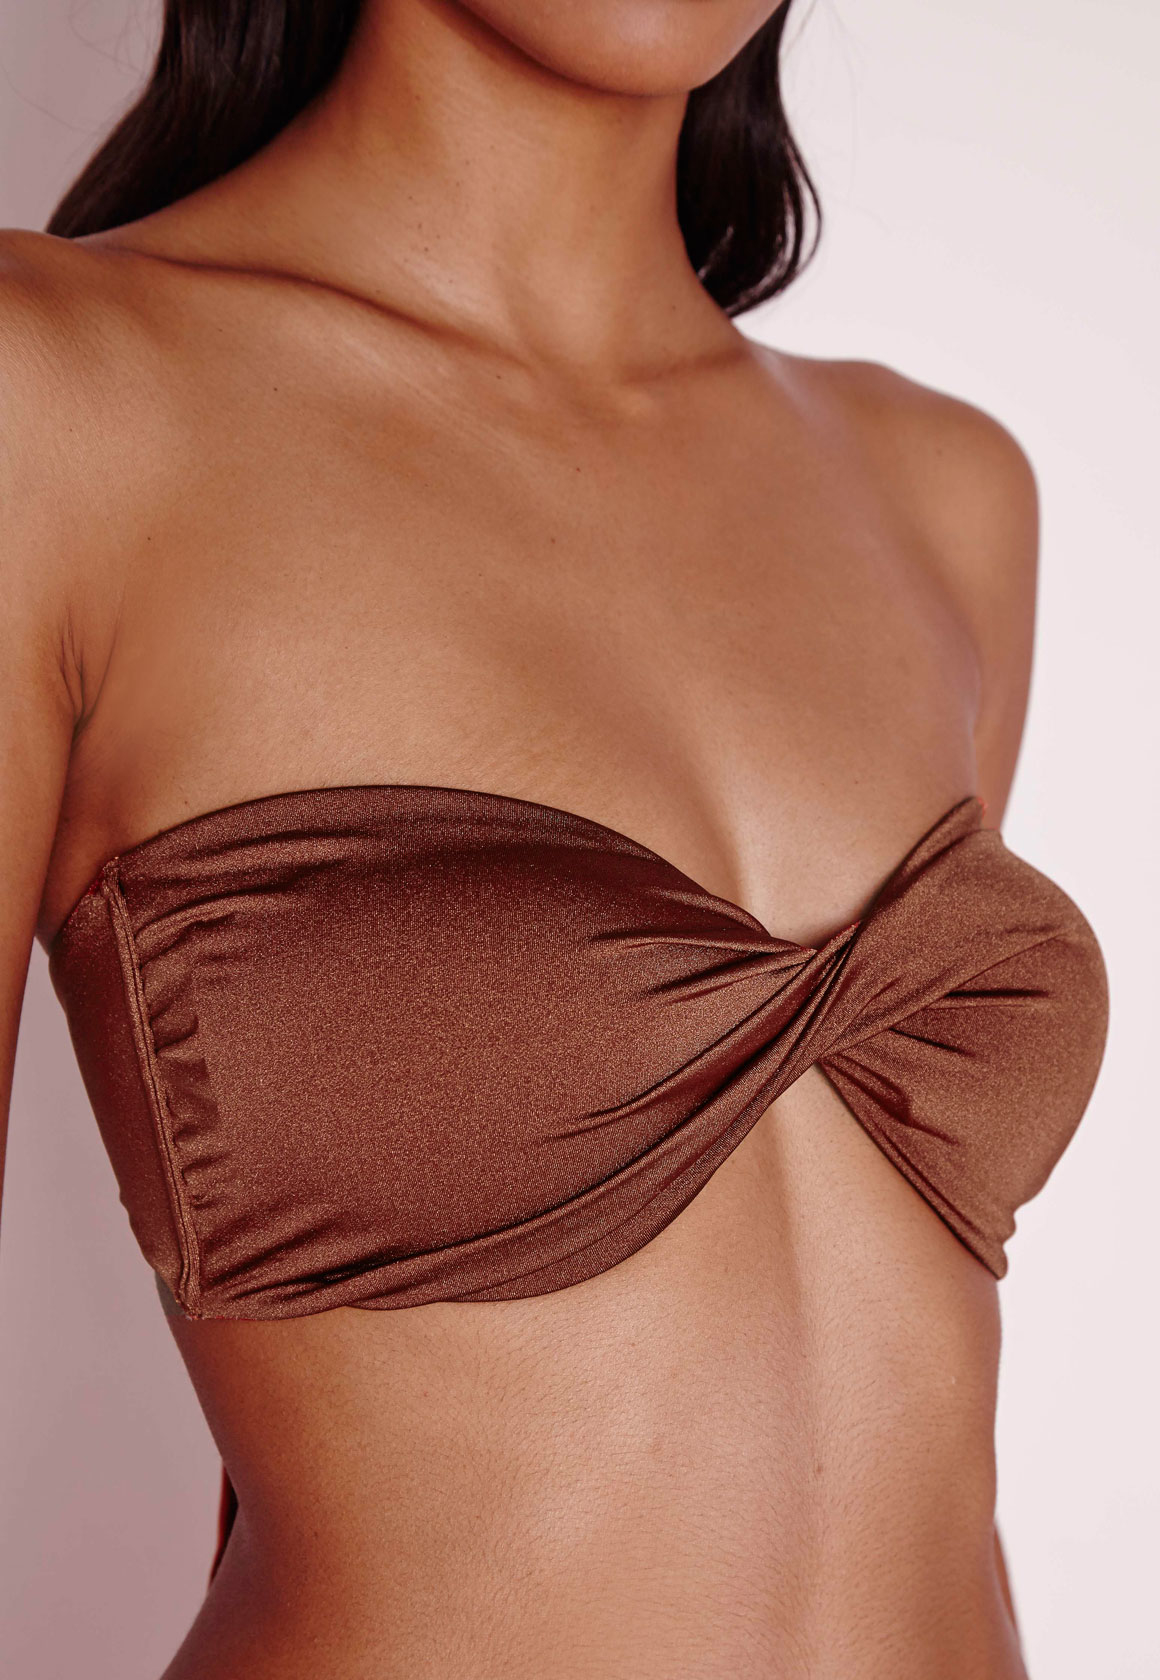 Hunza G Gloria Embellished Seersucker Bandeau Bikini ($) I'm Certifiably Obsessed With Gigi Hadid's Brown Bikini — It's All I'm Missing This Summer. She Made Me Sita Bikini Top in Sand.